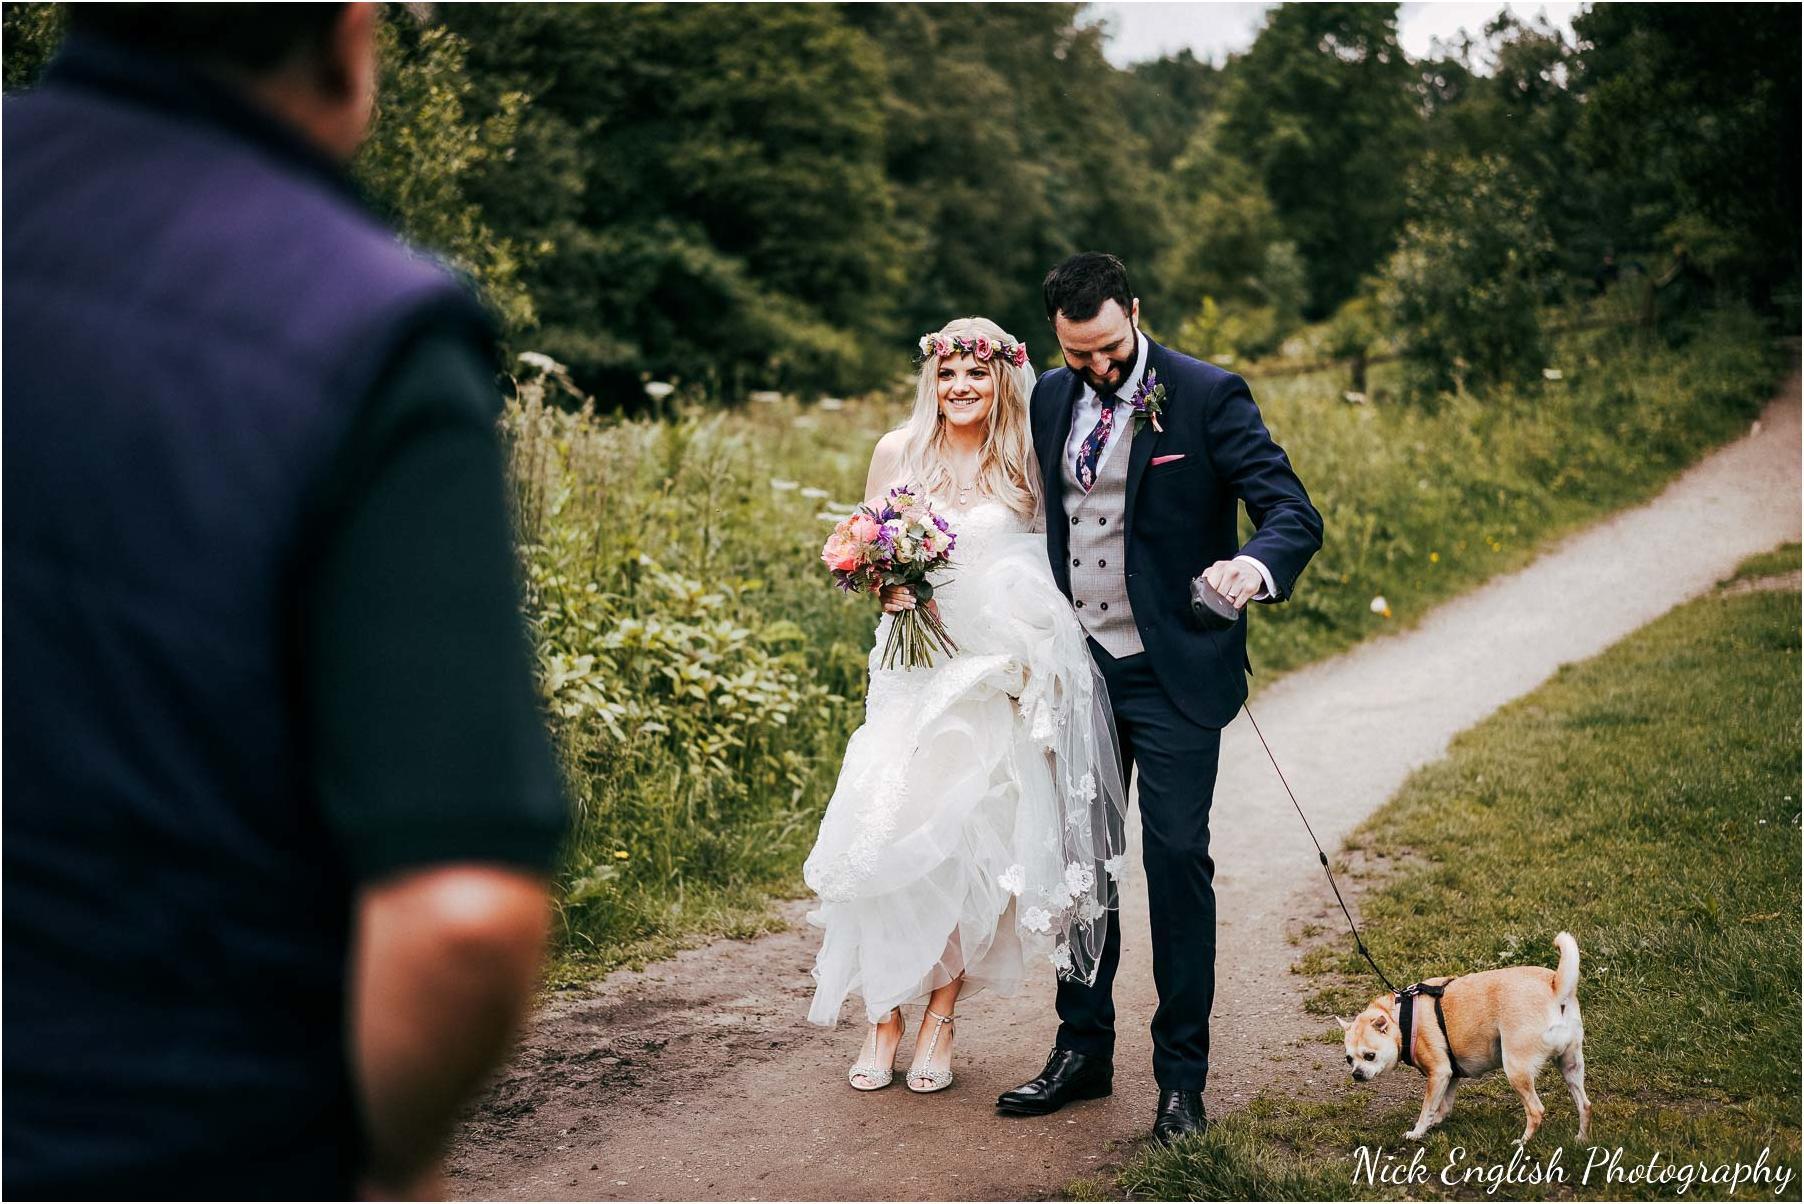 Whitebottom_Farm_Wedding_Manchester_Photograph-46.jpg